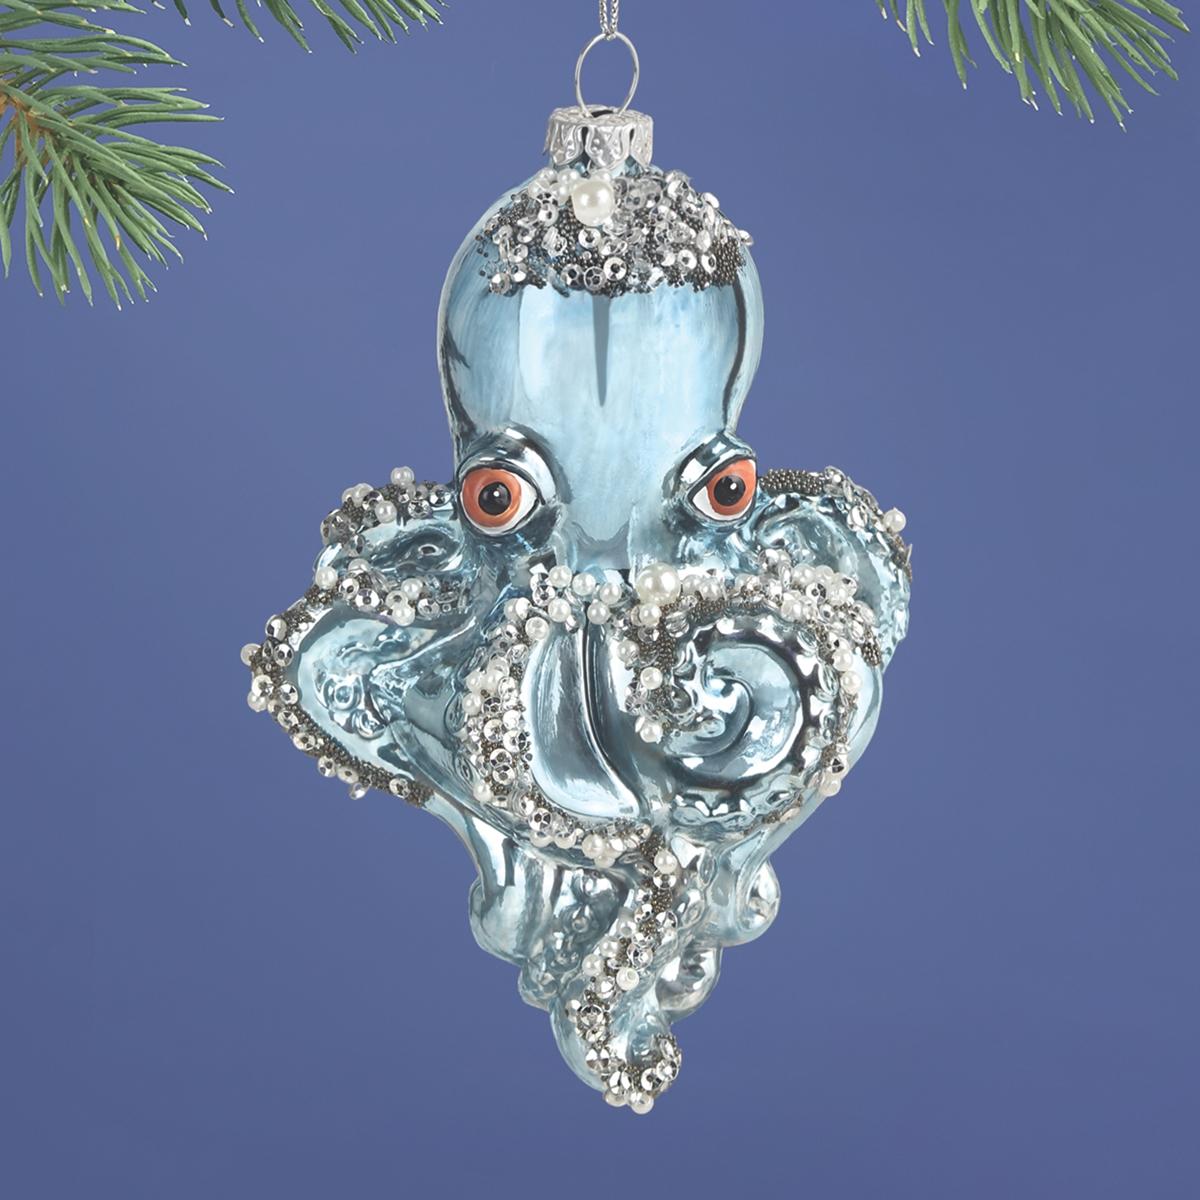 Octopus Glass Ornament